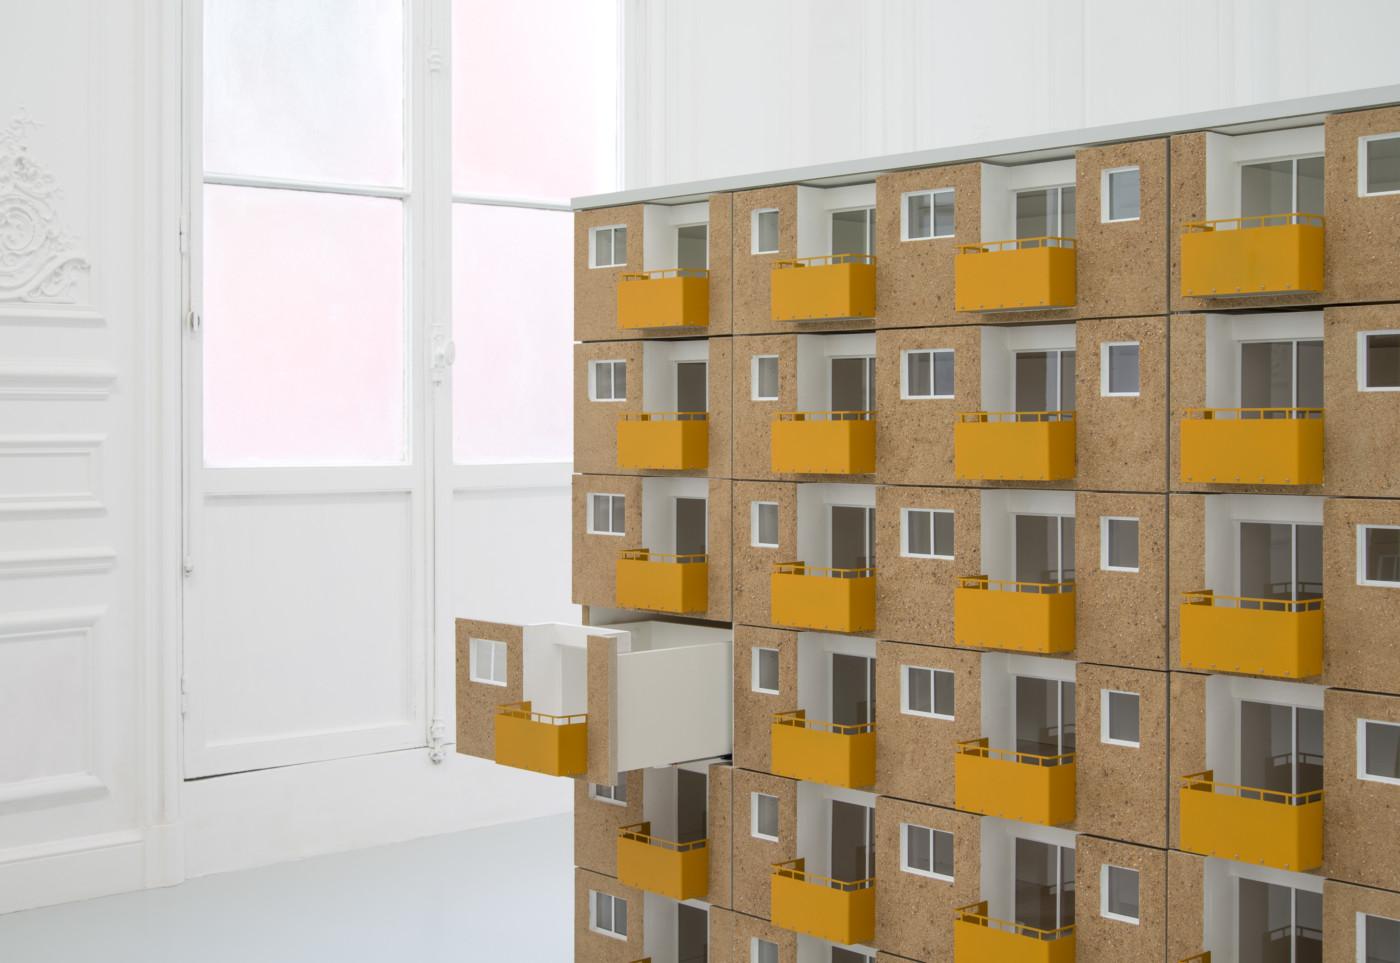 PENTTI MONKKONEN  Bâtiment B  (detail), 2017 Wood, resin, sand, steel, paint, acrylic glass, aluminum, tar, rubber, hardware 144 x 160,5 x 48,5 cm / 56.7 x 63.2 x 19.1 in  - High Art Gallery Paris